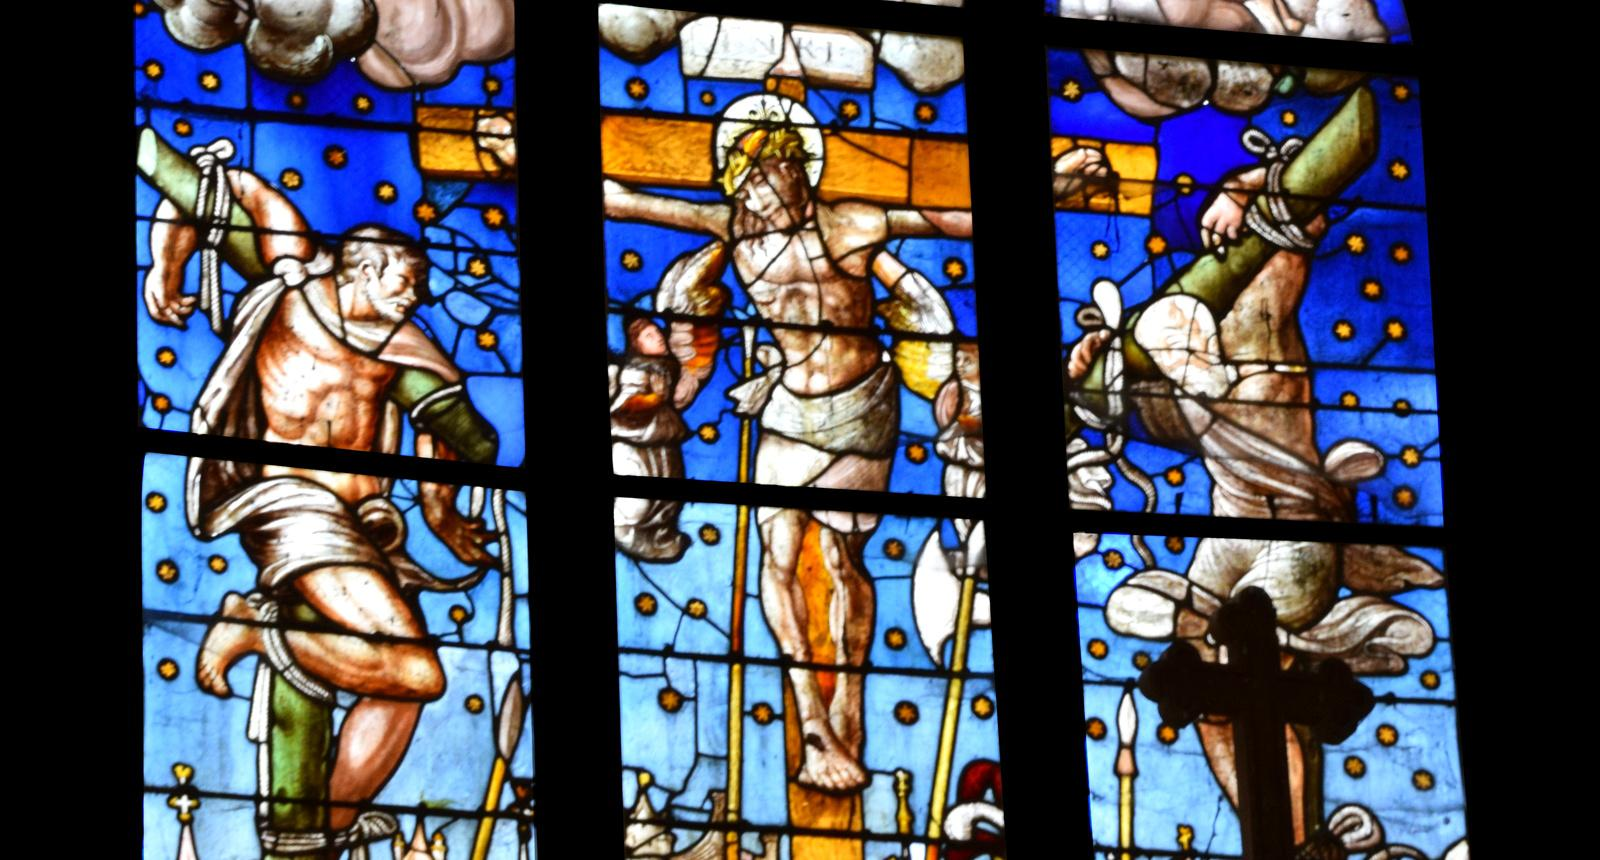 Eglise Saint-Sébastien, Villemoiron-en-Othe